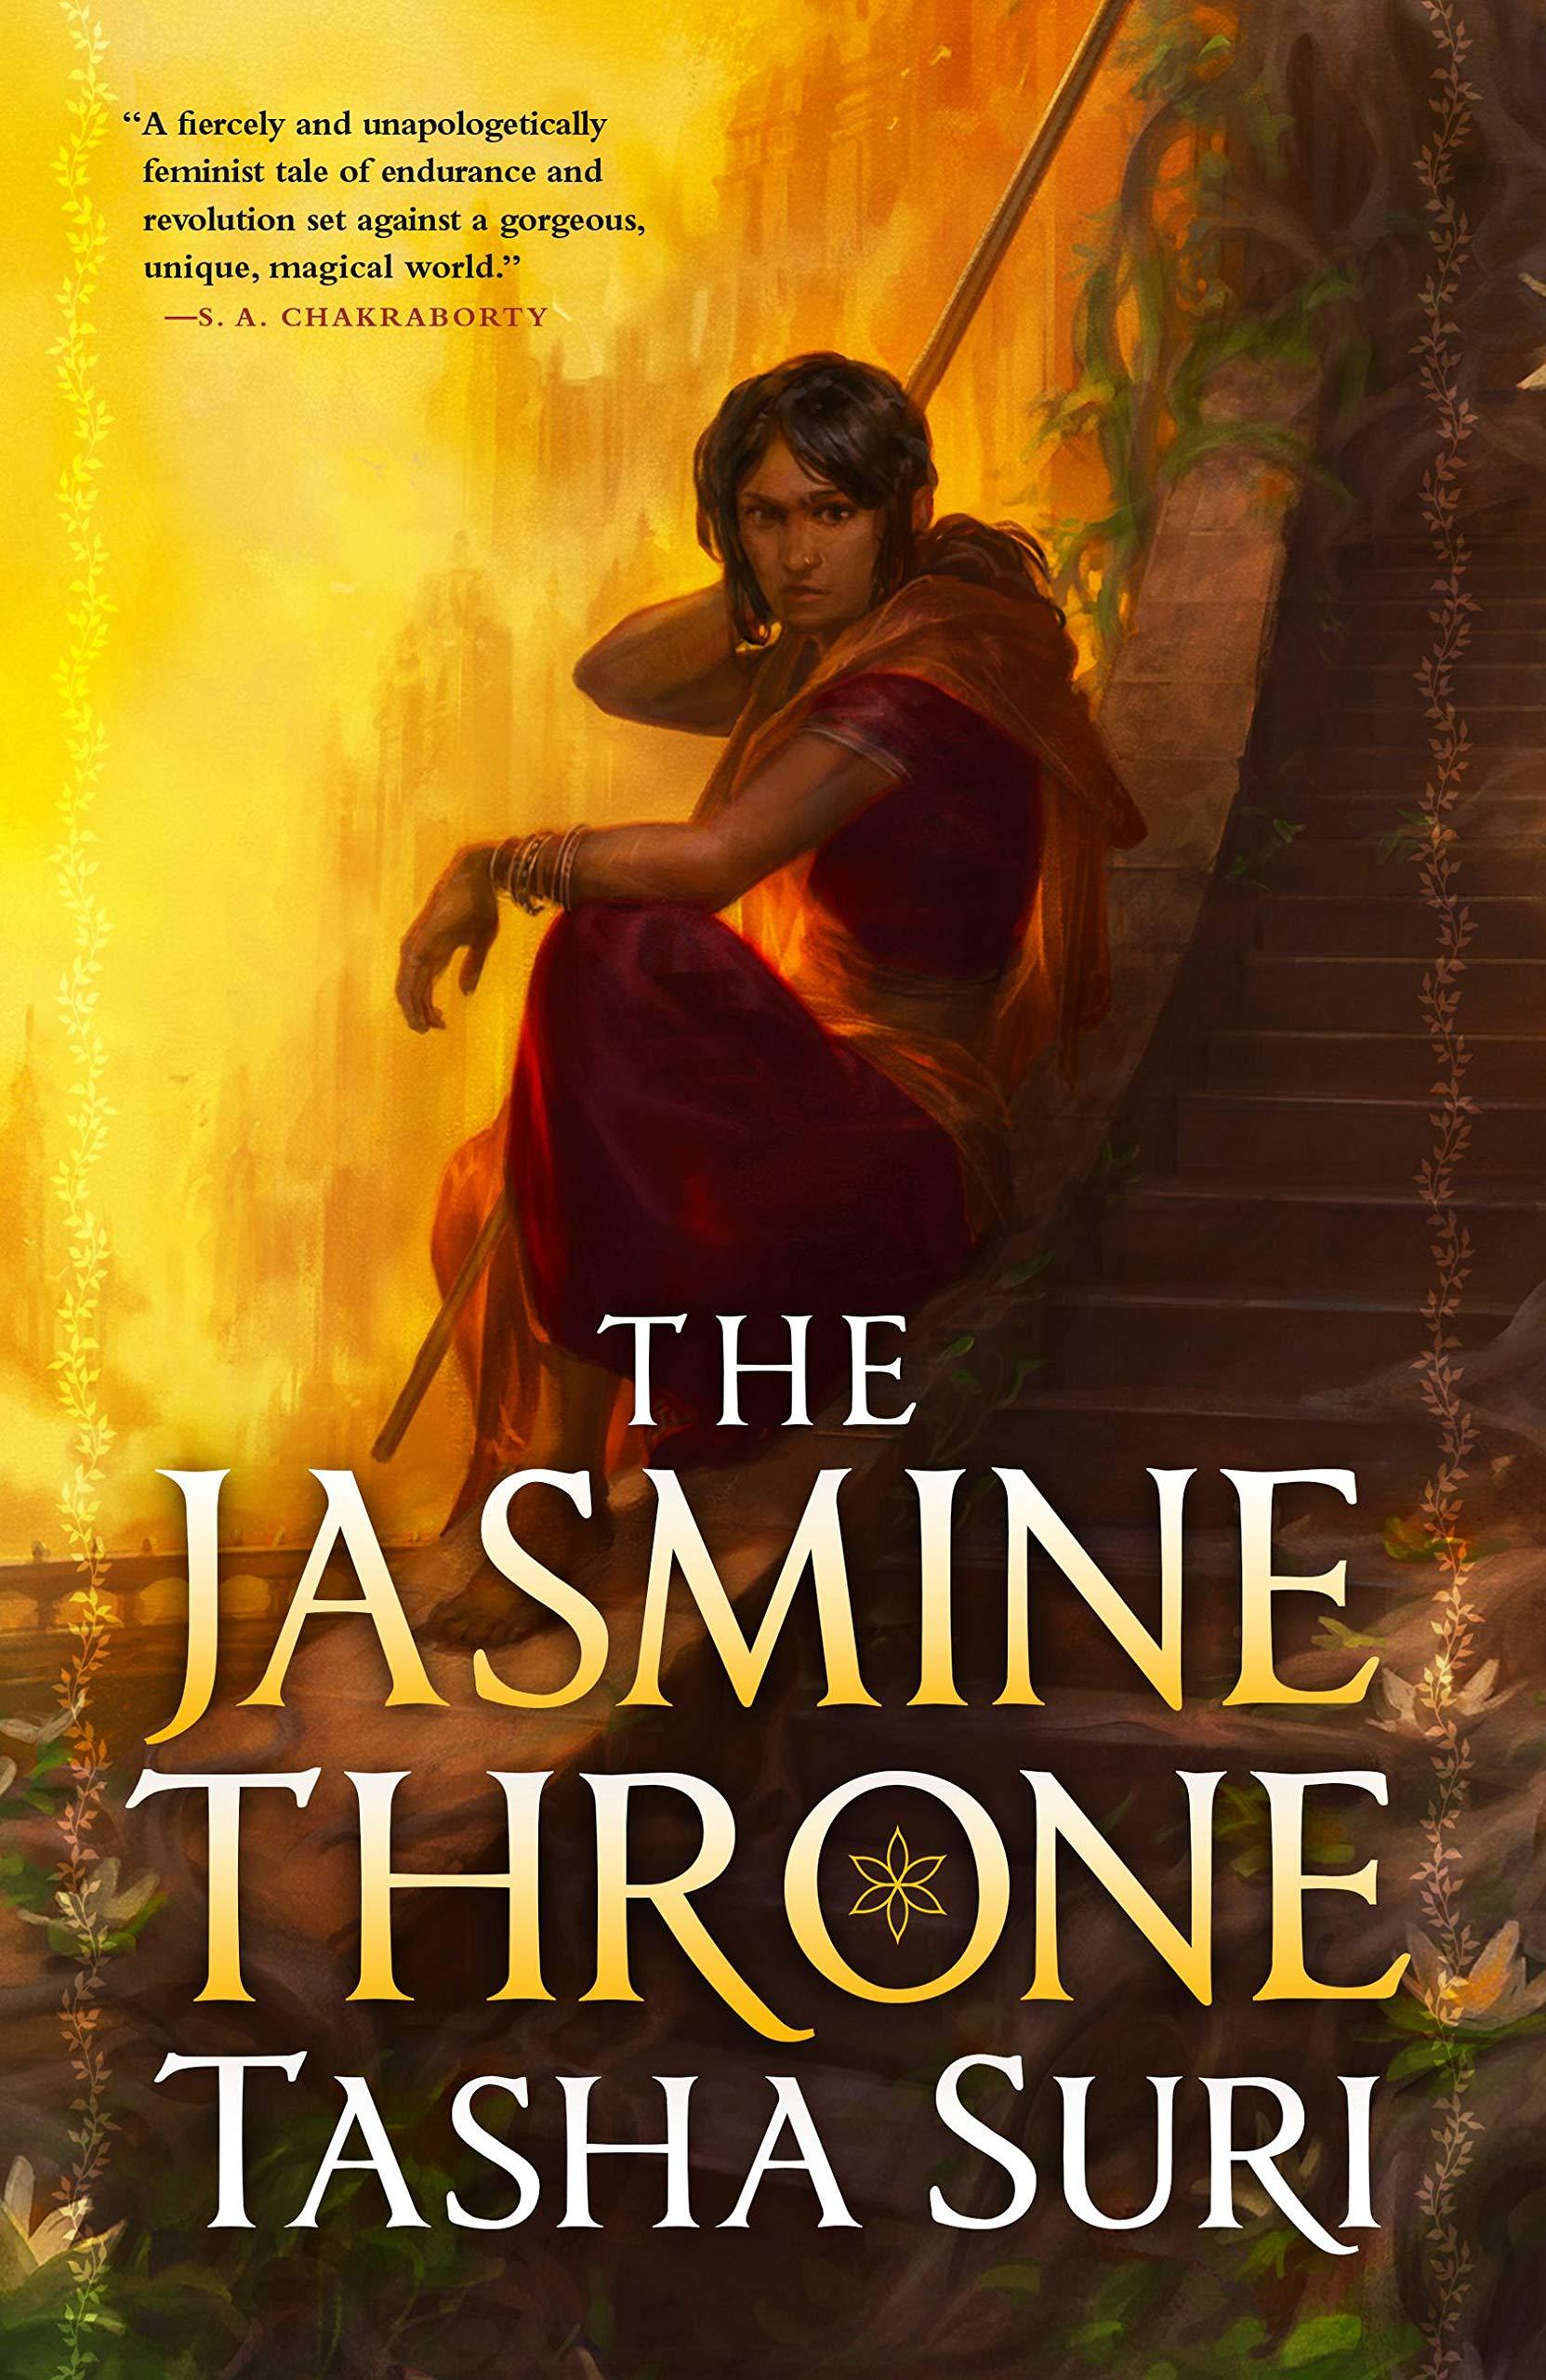 Amazon.com: The Jasmine Throne (The Burning Kingdoms, 1): 9780316538510:  Suri, Tasha: Books